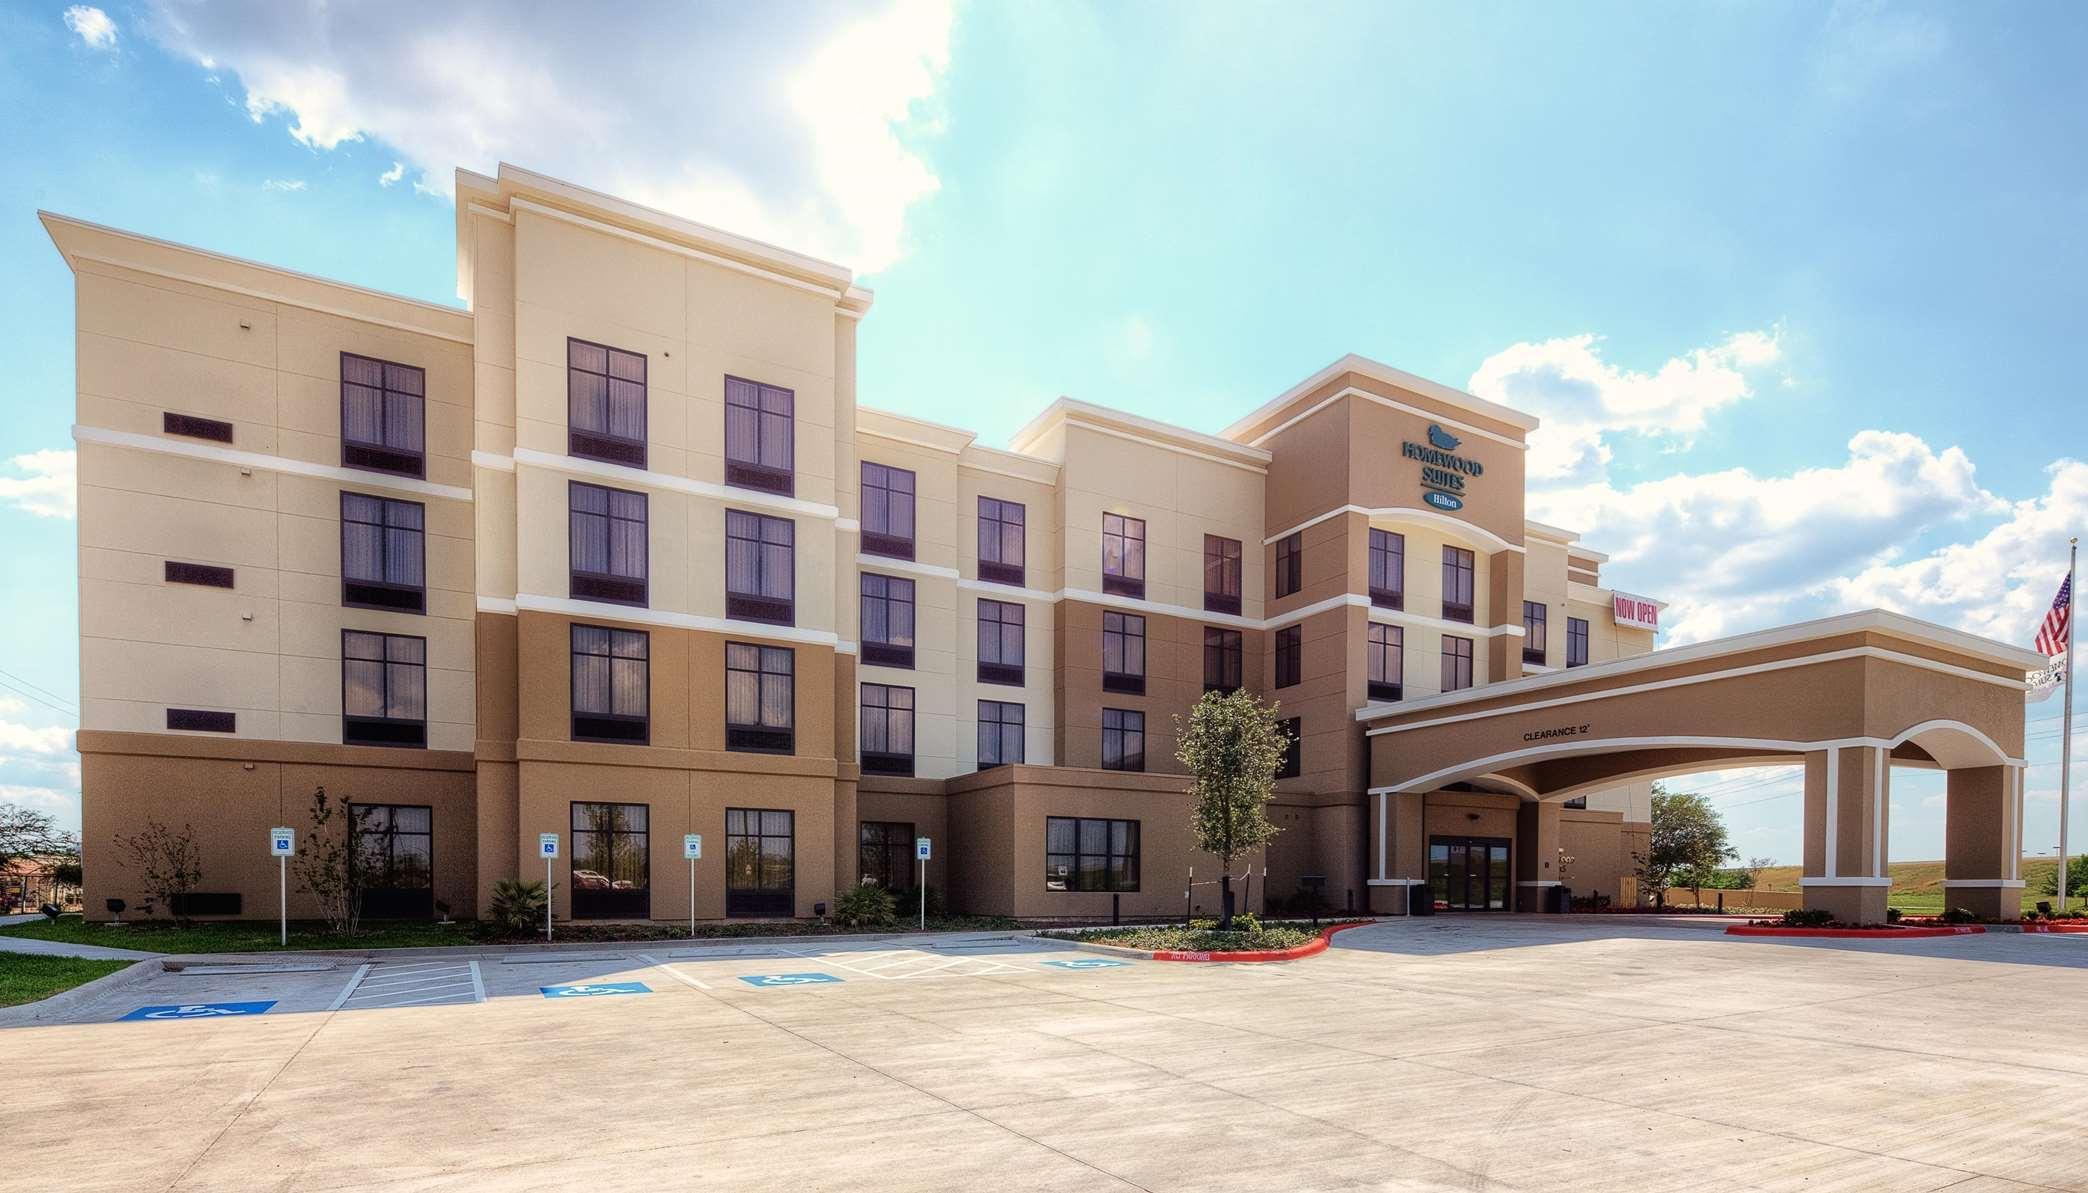 Homewood Suites by Hilton Victoria, TX image 2